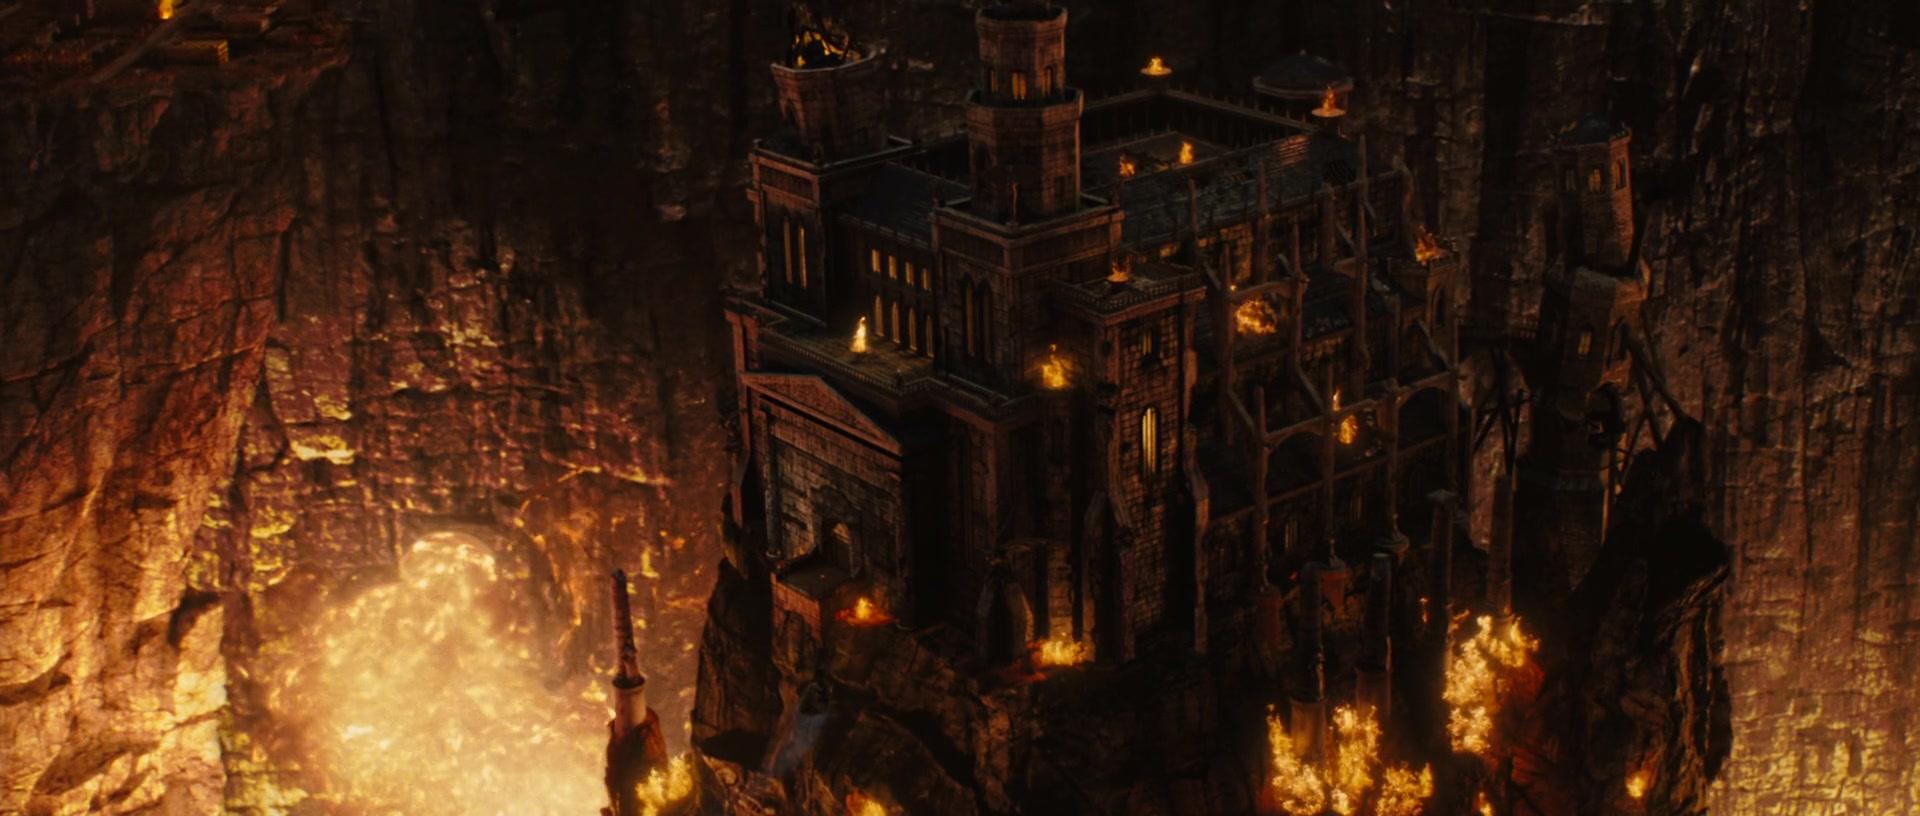 Hades Palace  Riordan Wiki  FANDOM powered by Wikia